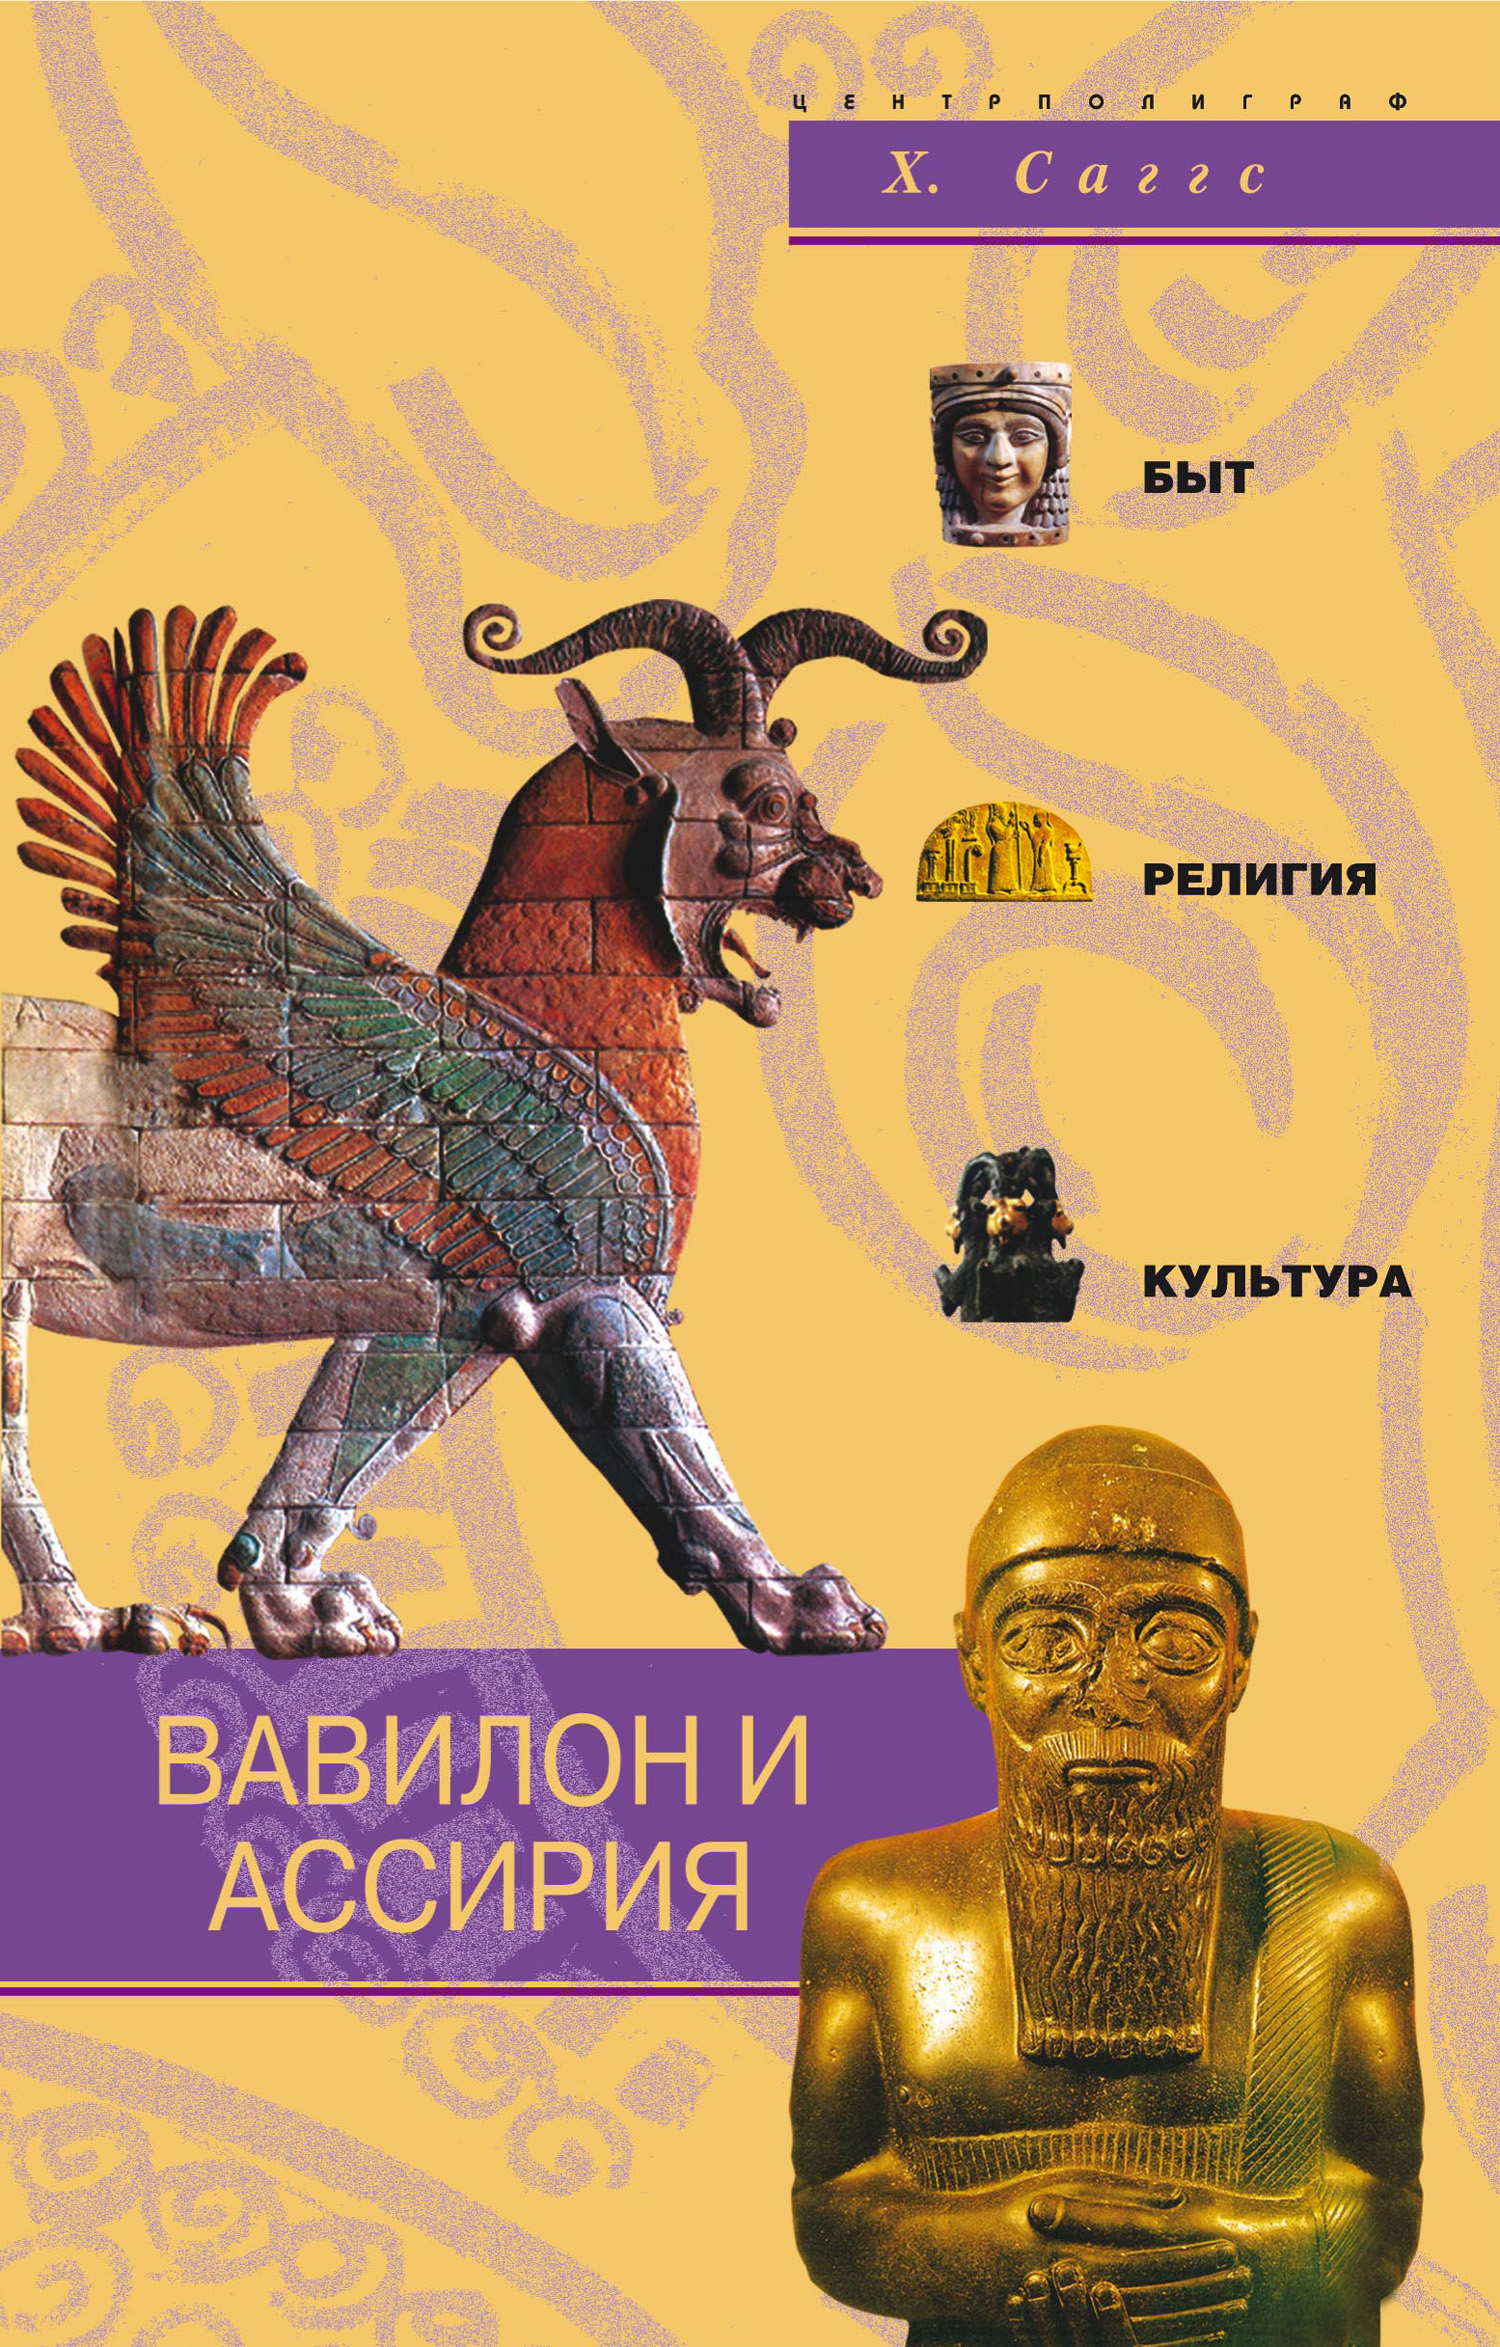 Генри Саггс Вавилон и Ассирия. Быт, религия, культура луи боден инки быт культура религия